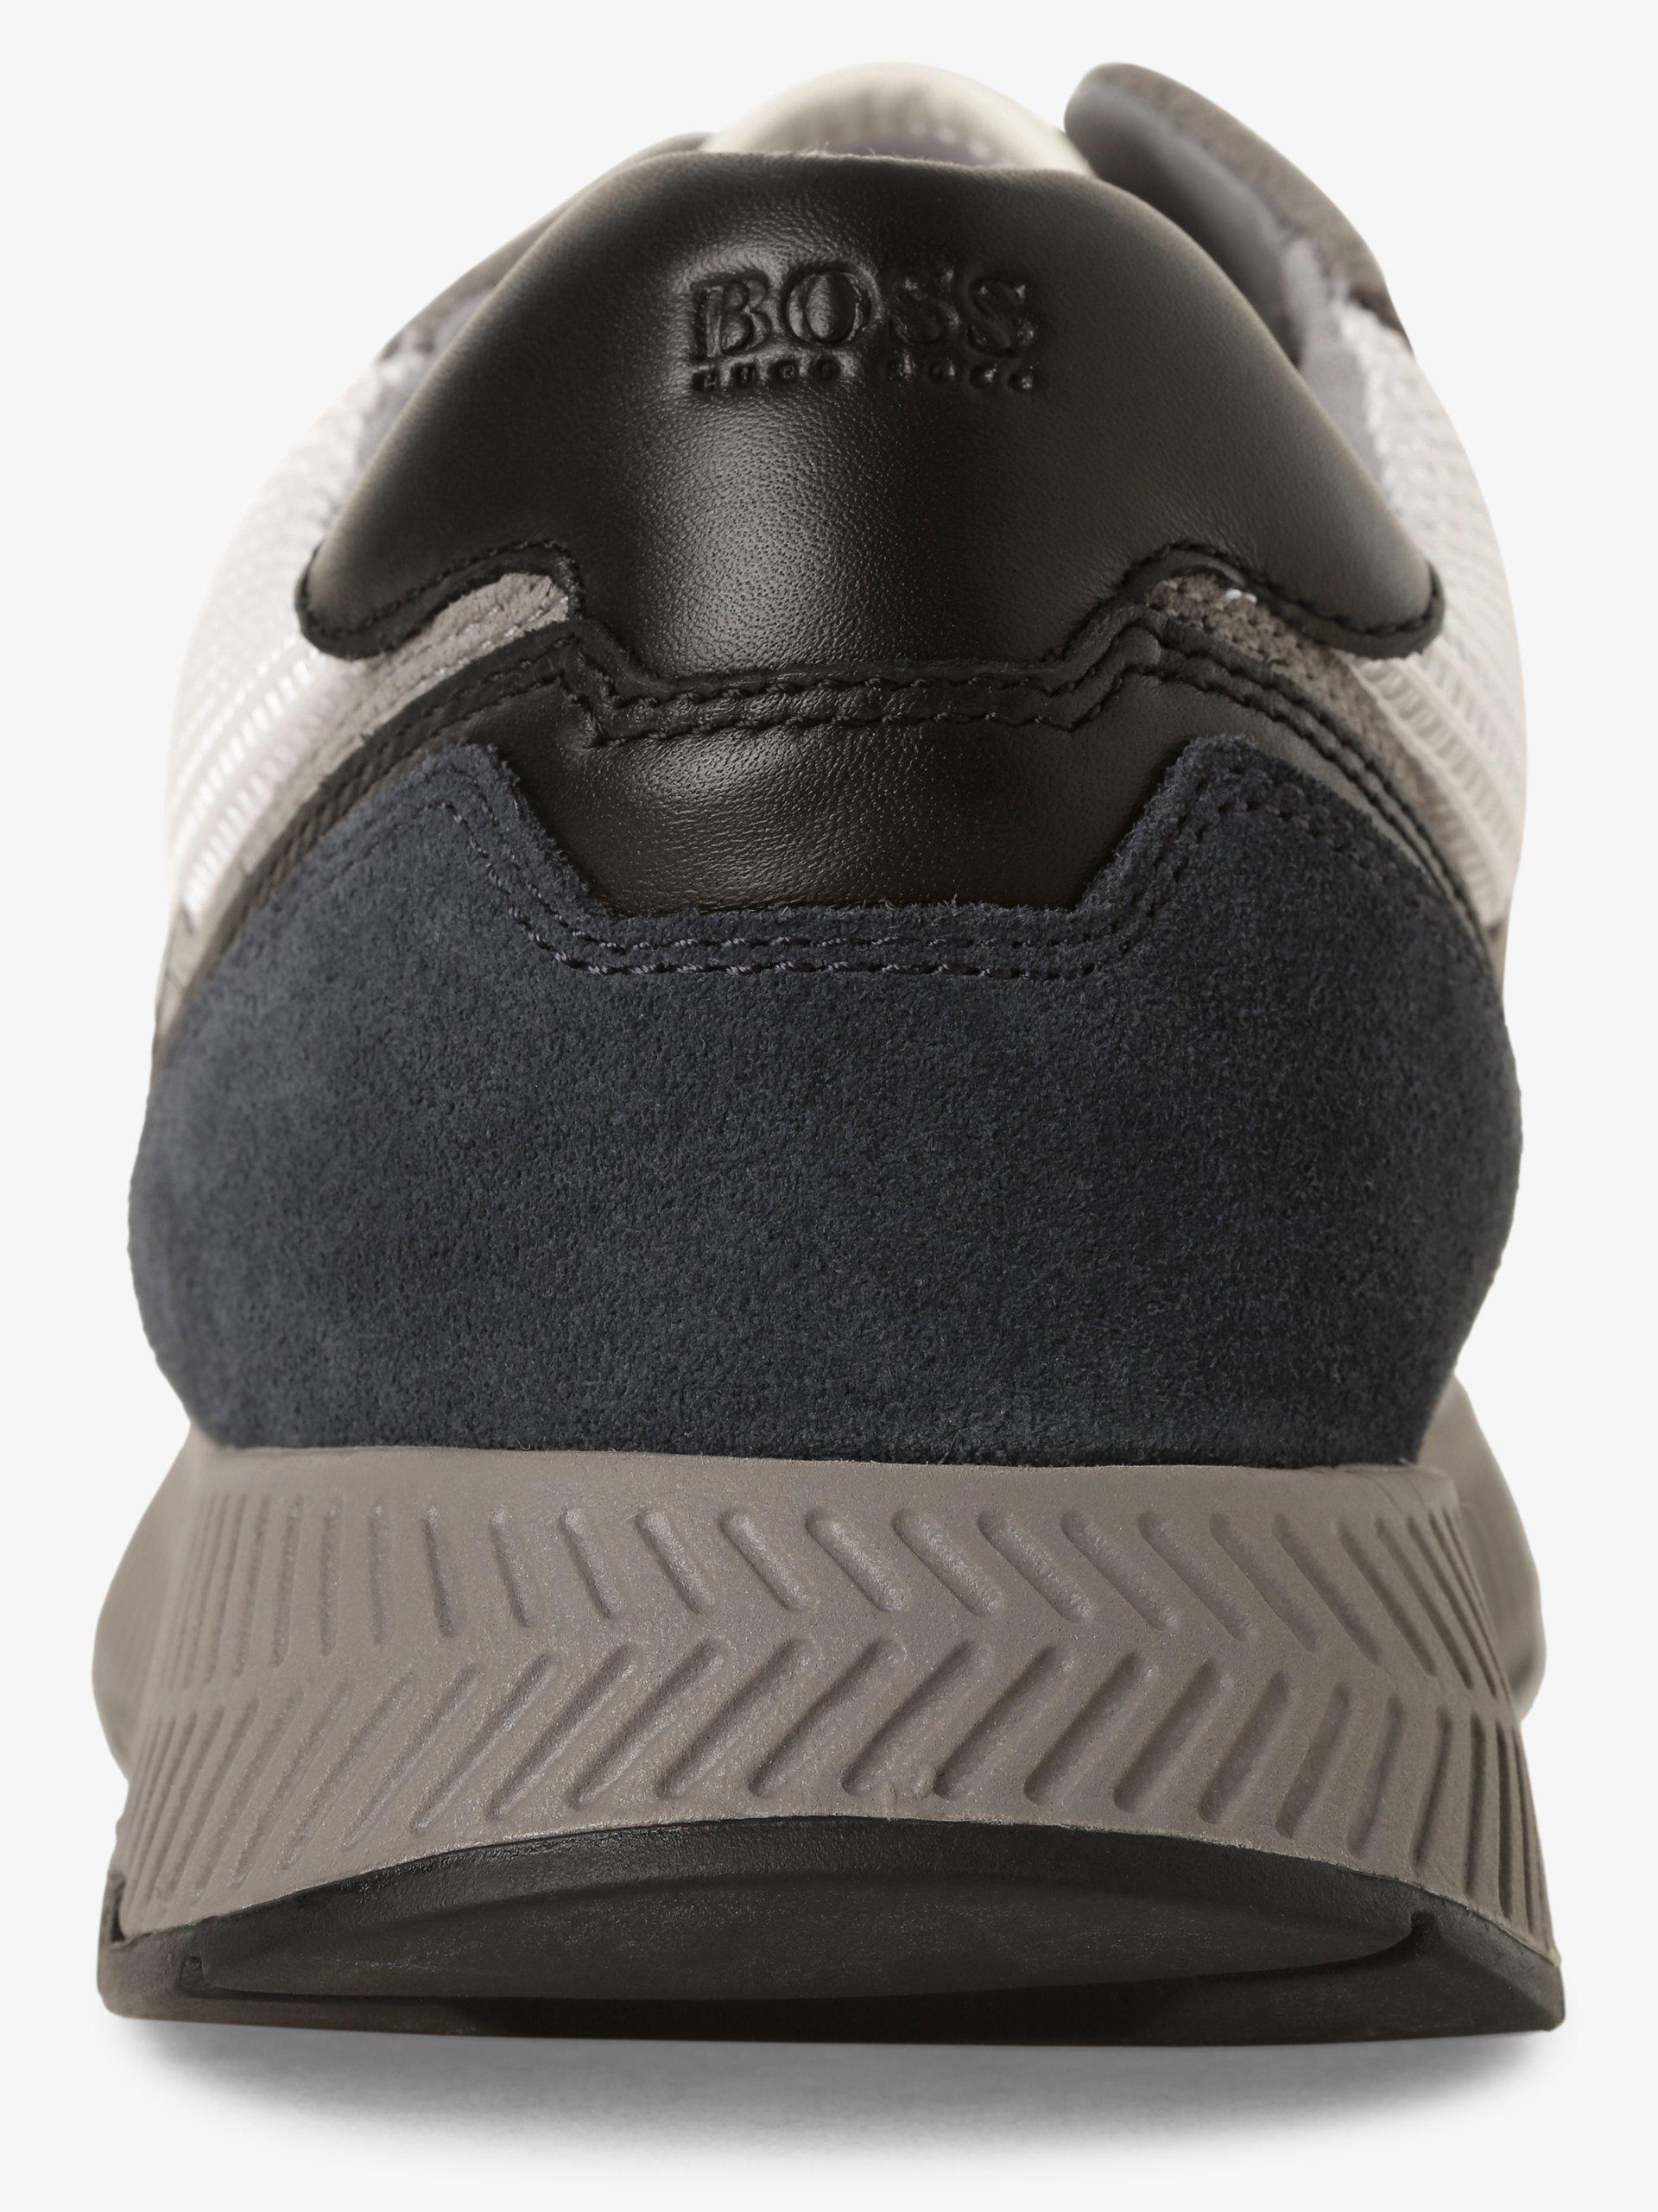 BOSS Herren Sneaker mit Leder-Anteil - Titanium